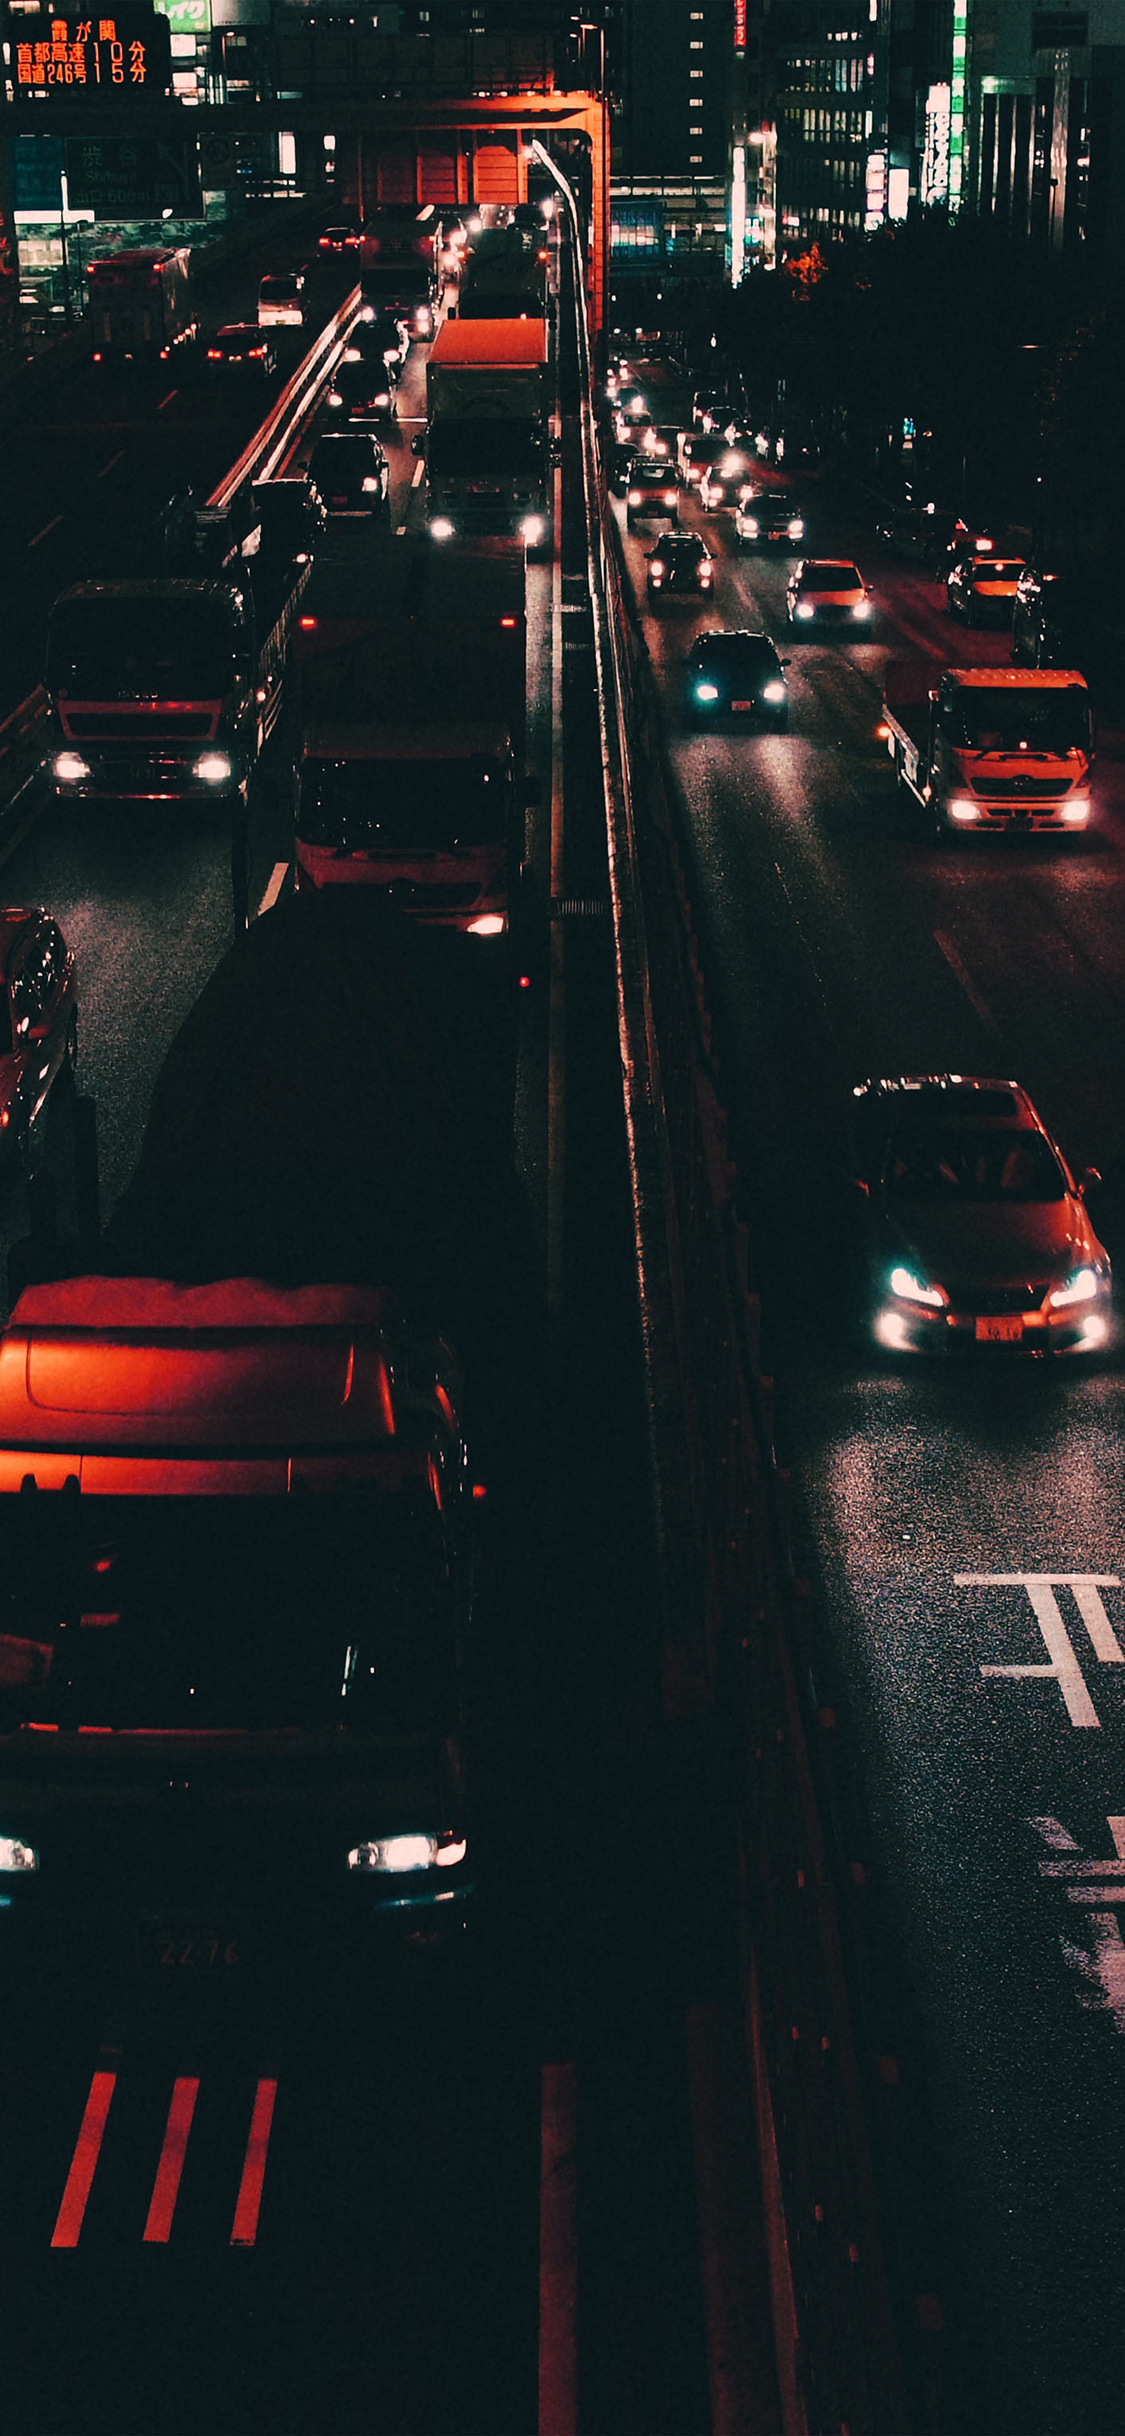 Iphonexpapers Com Iphone X Wallpaper Nk70 Street Car Japan Night Orange